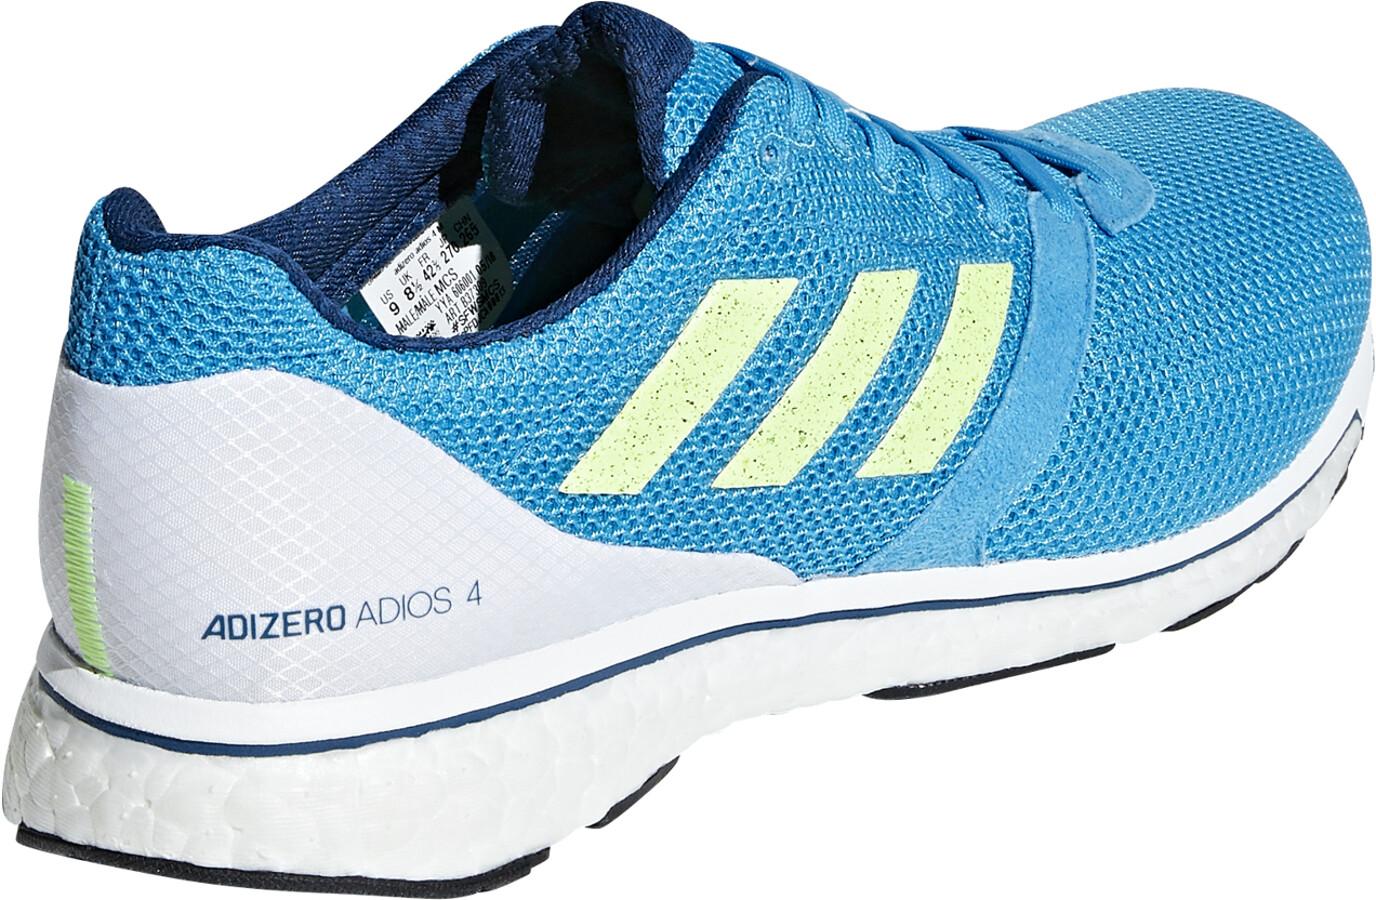 hot sale online 01c47 8ee62 adidas Adizero Adios 4 scarpe da corsa Uomo turchese